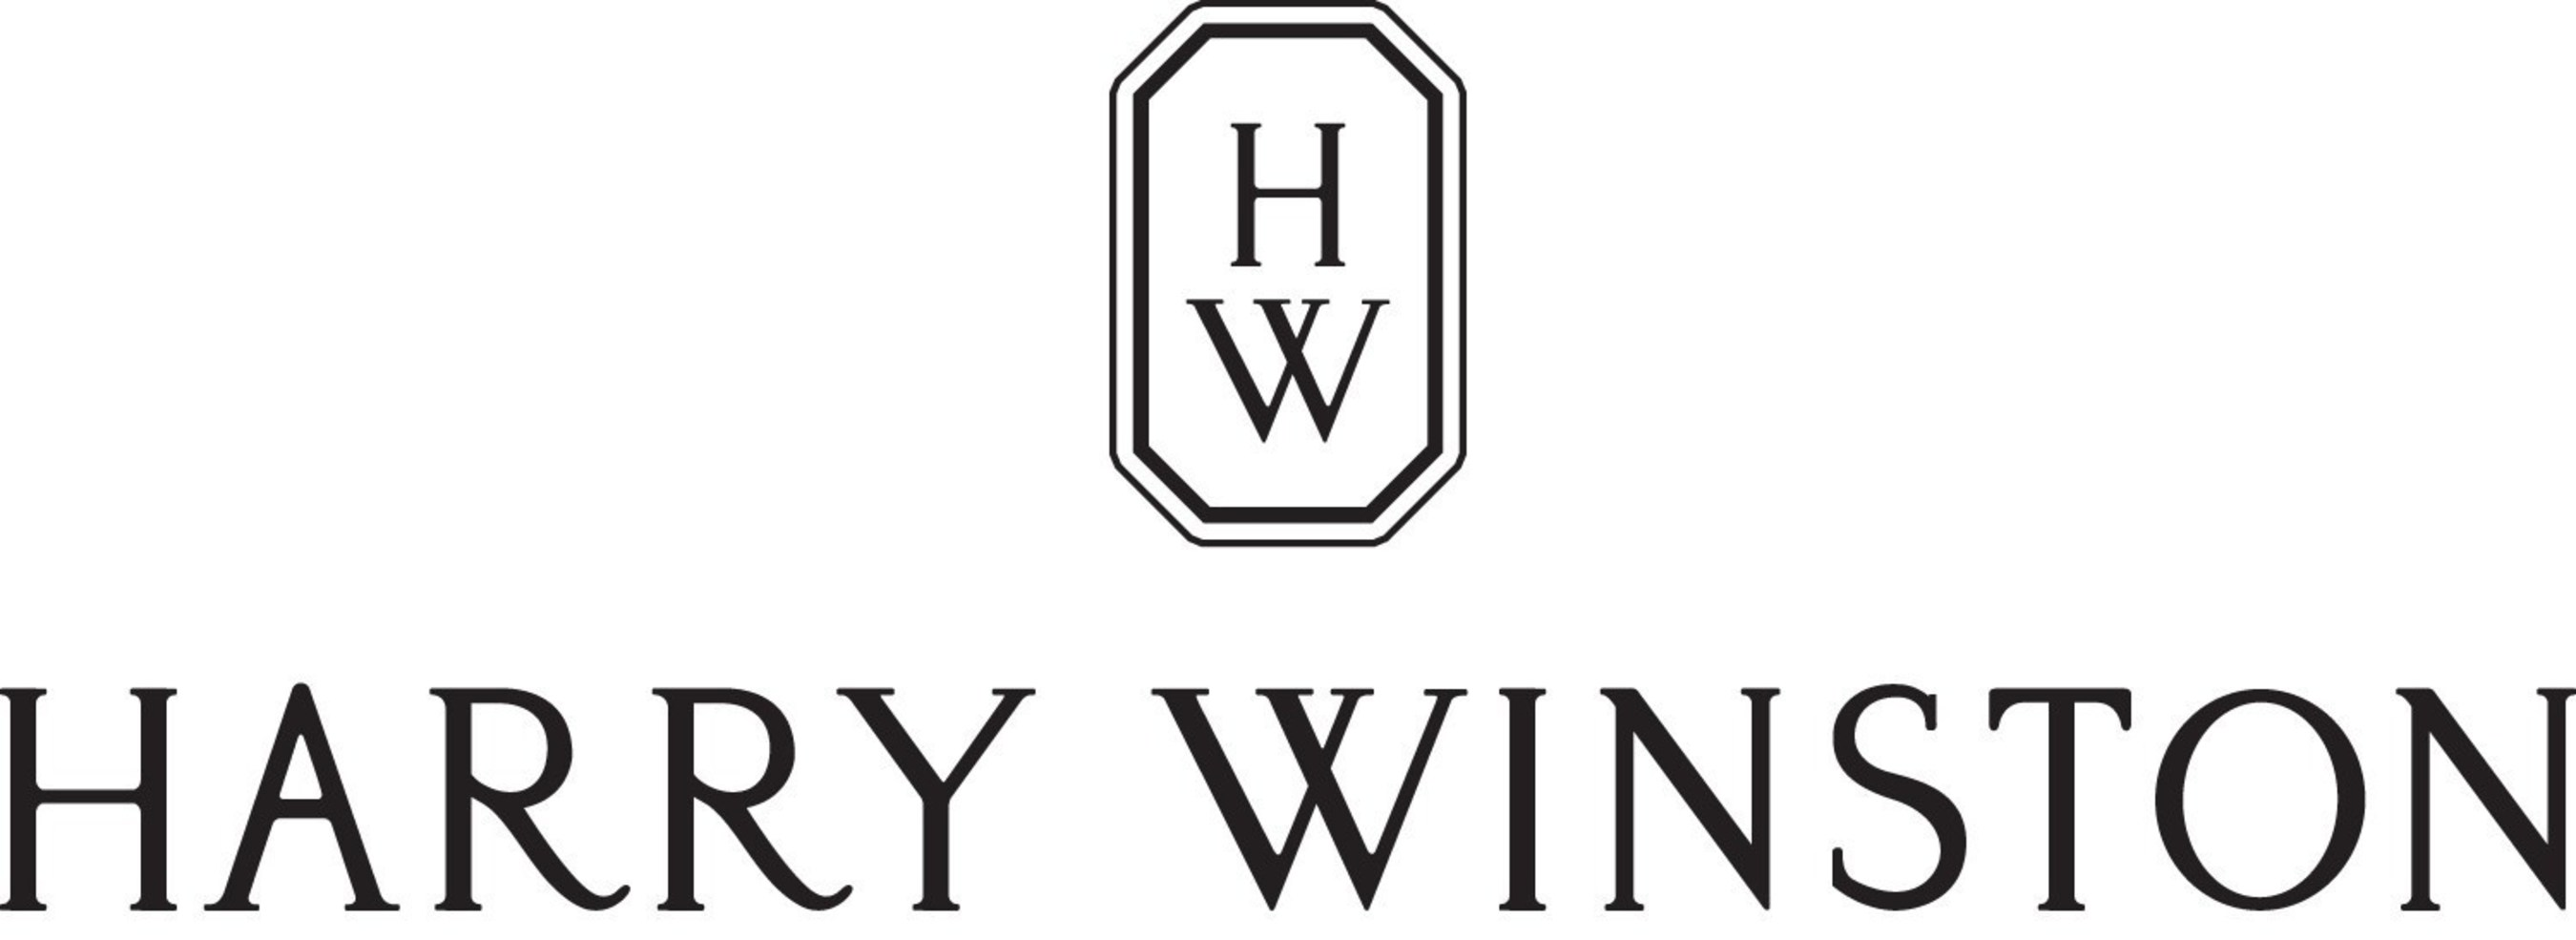 Harry Winston logo